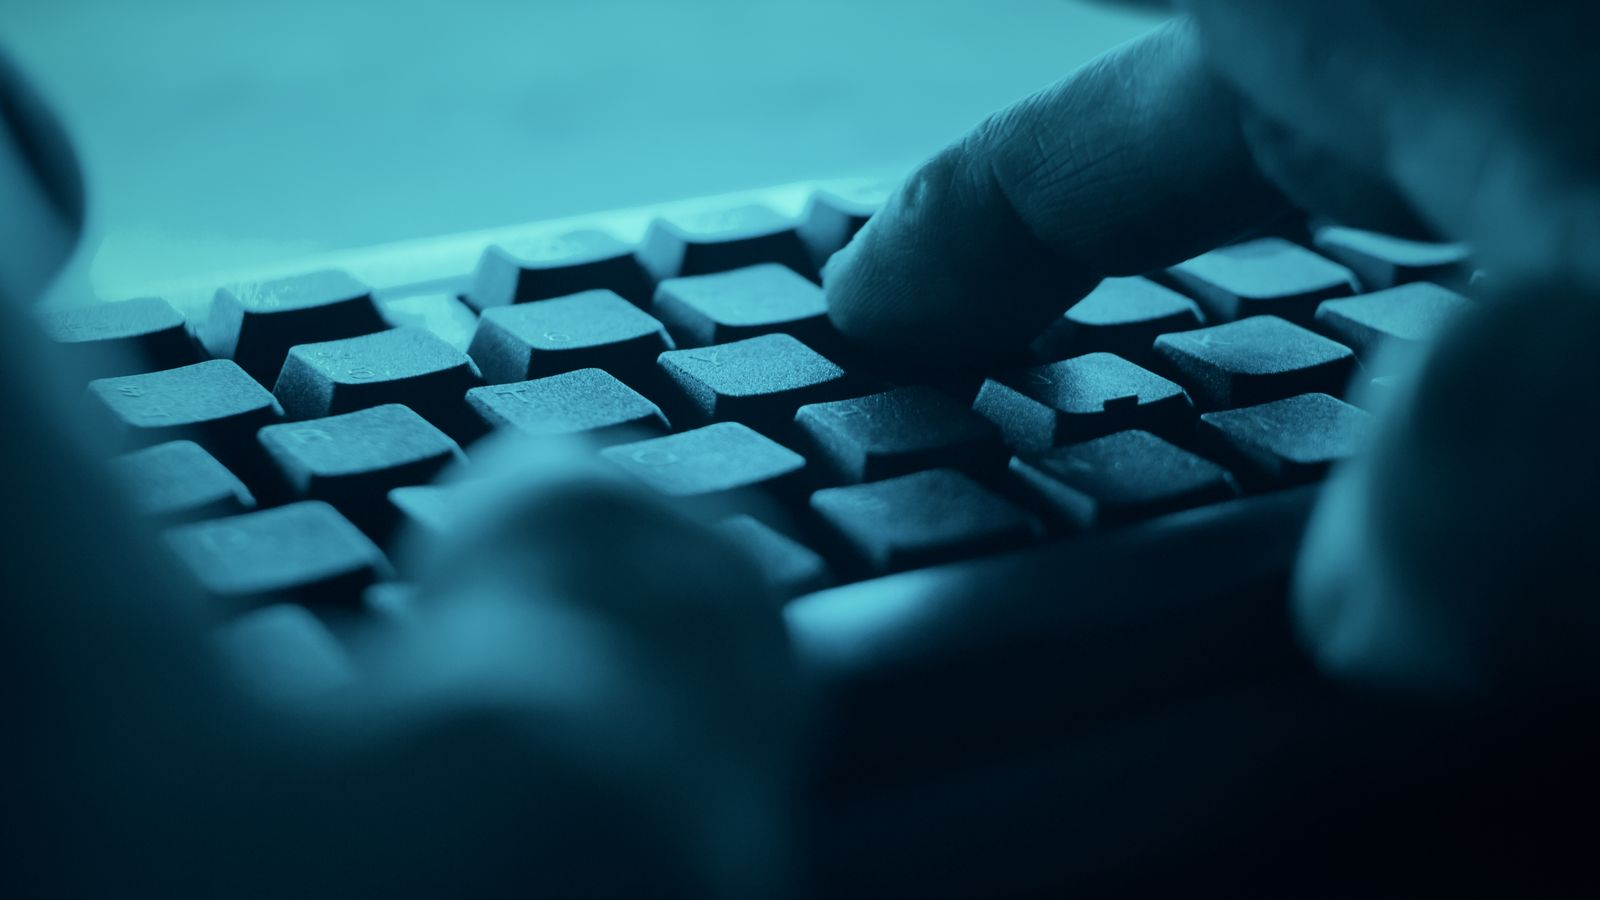 Hundreds held in dark web child pornography crackdown